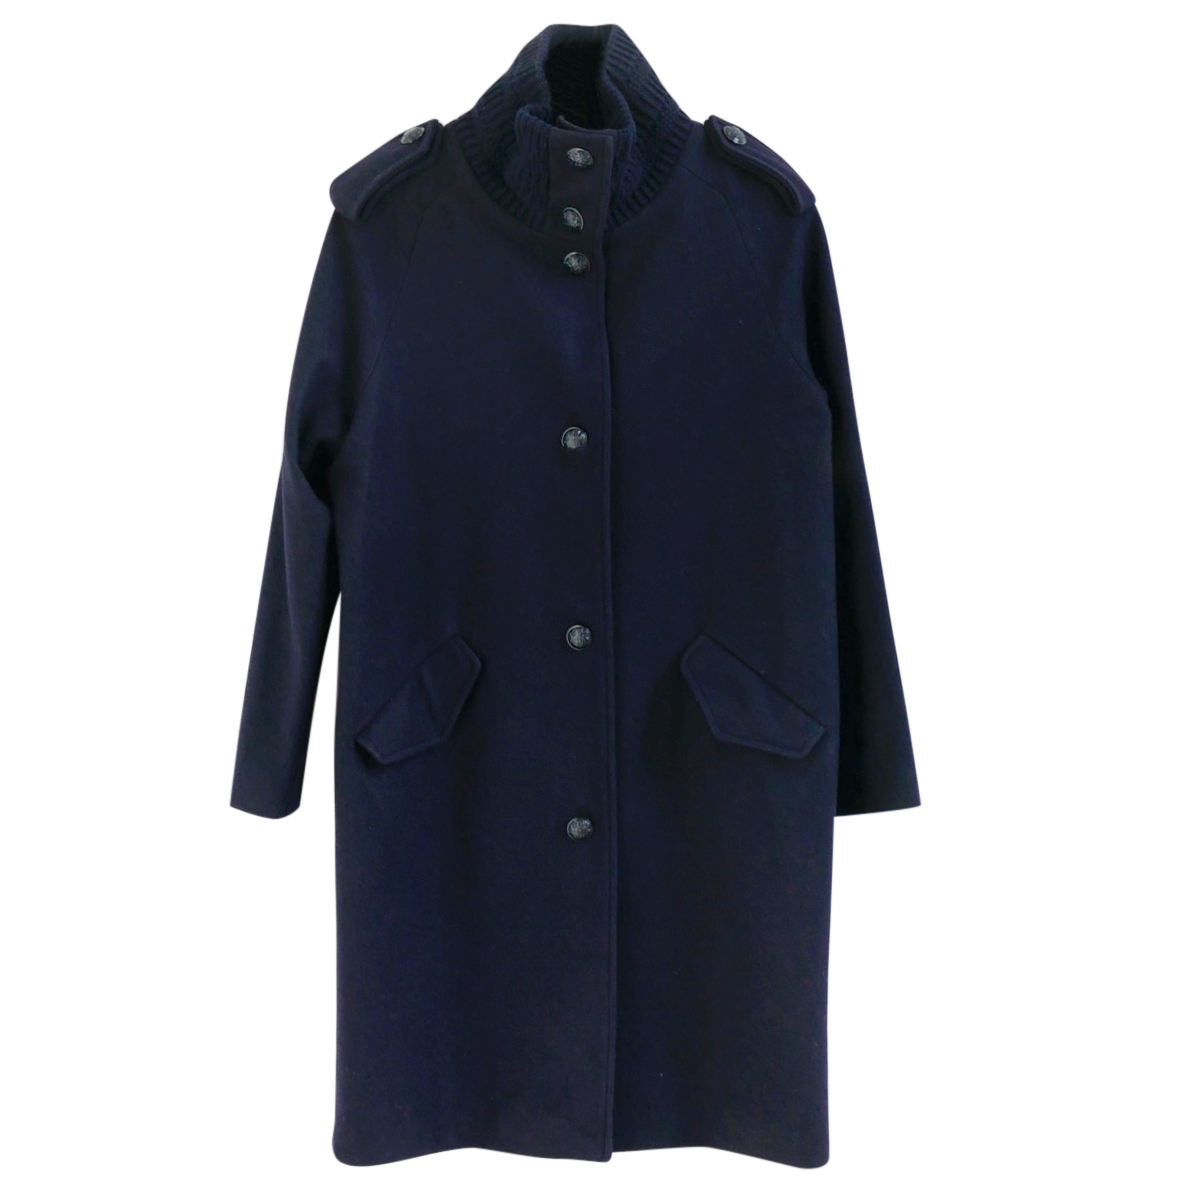 Sessun Simon Navy Heavy Wool Knit Collar Duffle Pea Coat